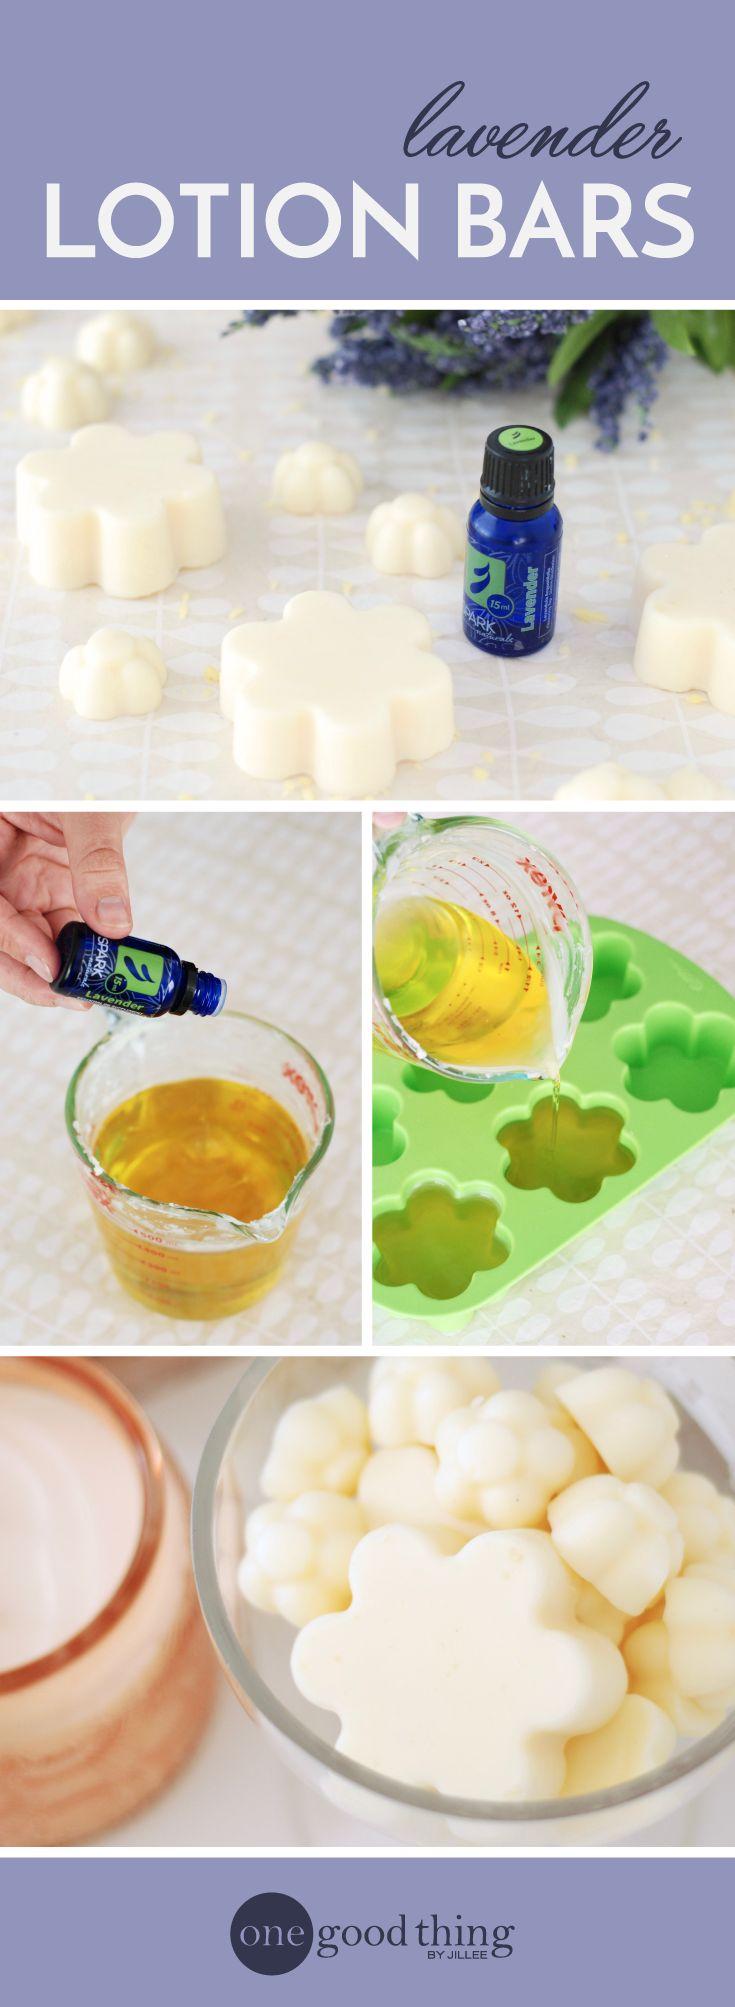 How to make homemade Lotion Bars